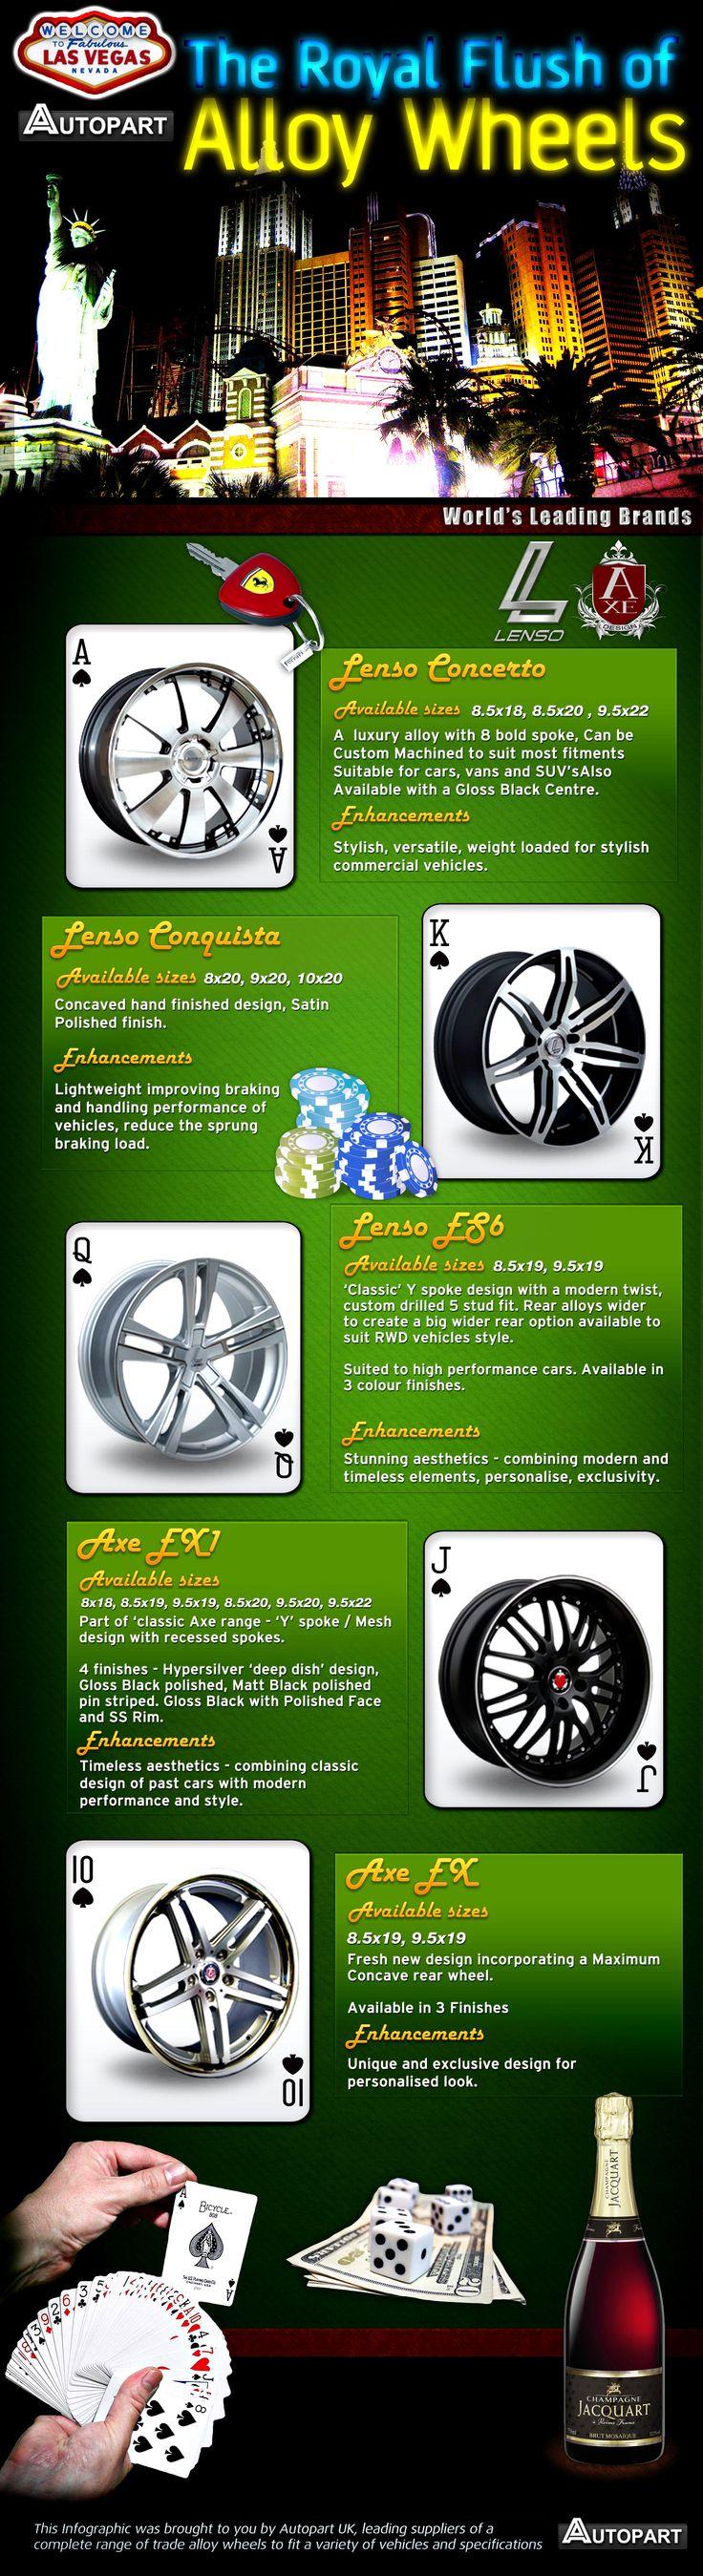 Autopart-Infographic